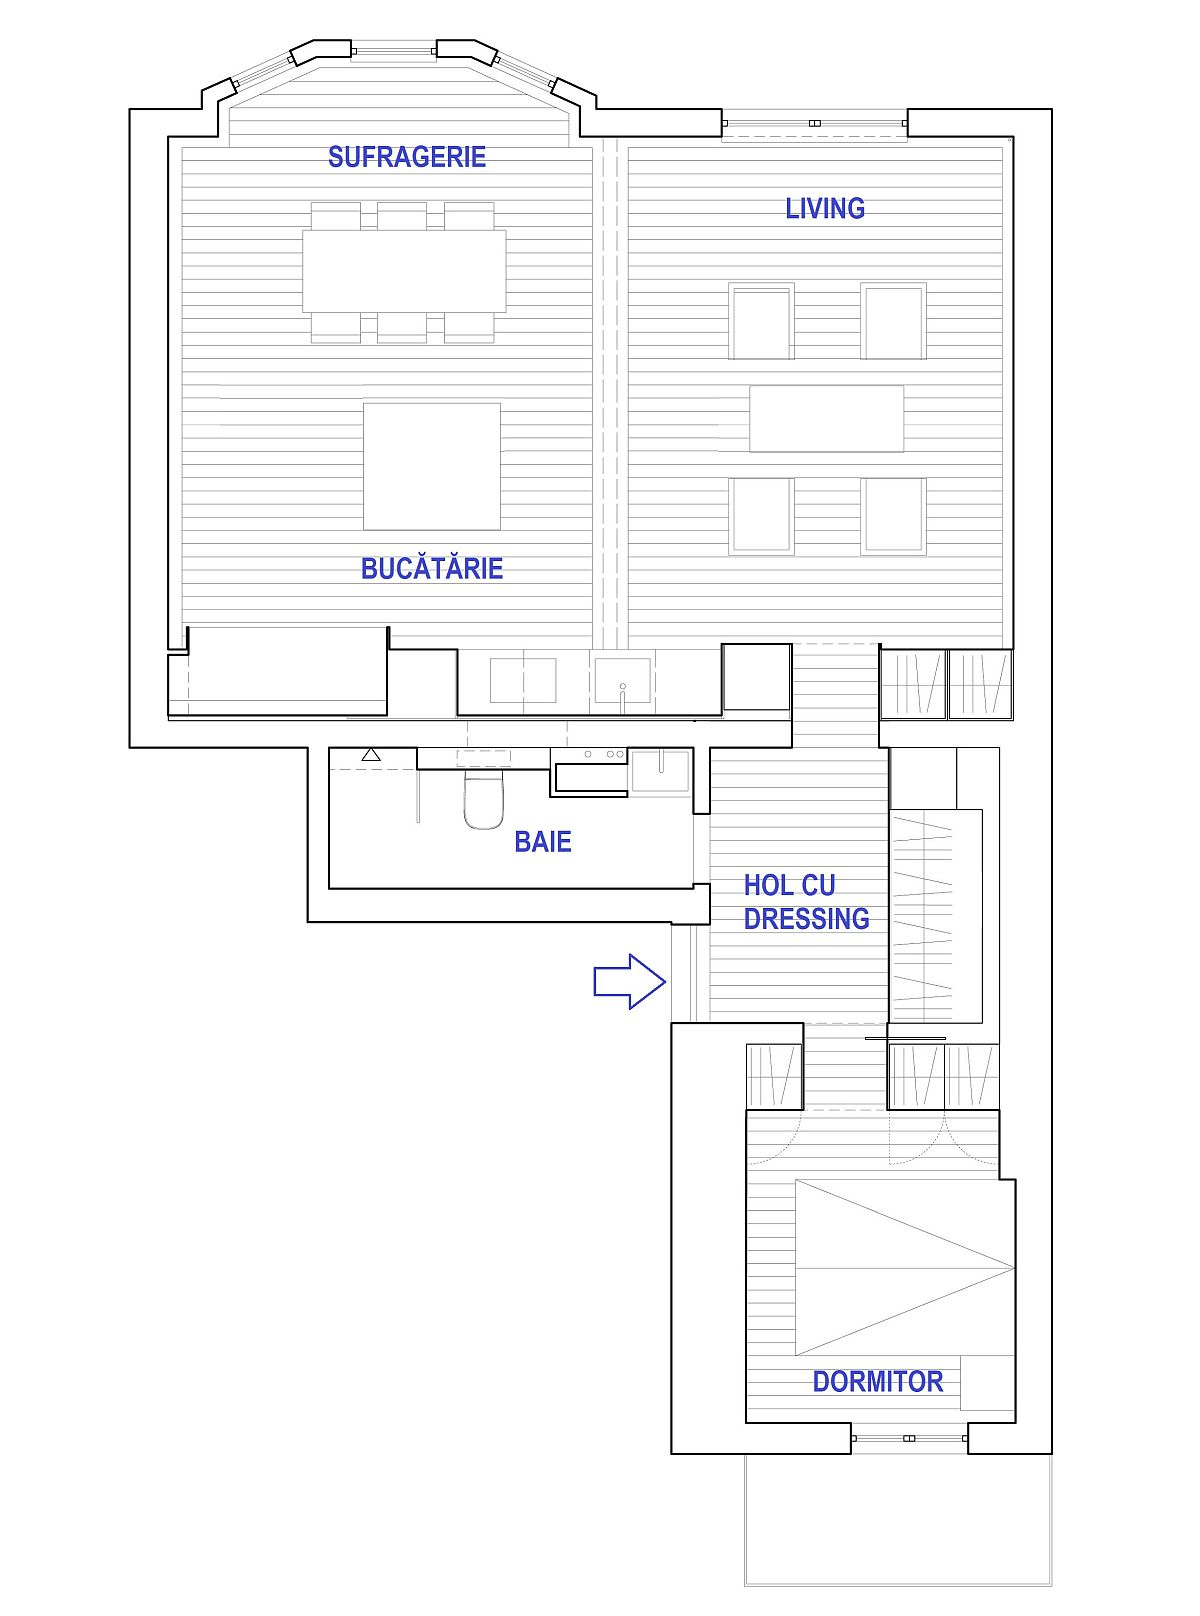 adelaparvu.com despre locuinta 80 mp, Suedia, design arh. David Lookofsky, plan